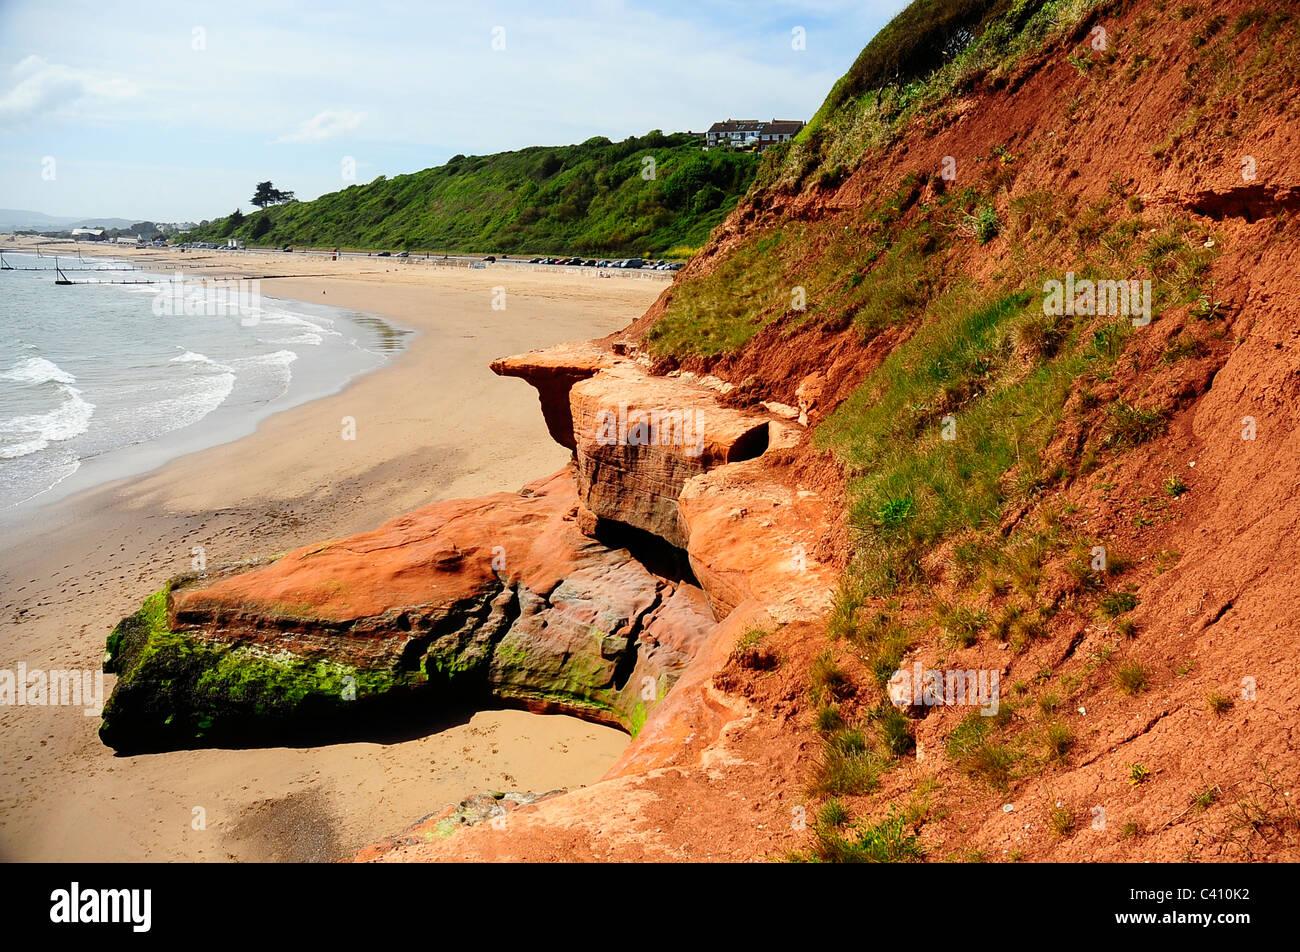 Orcombe point - Exmouth beach - Devon - UK - Stock Image